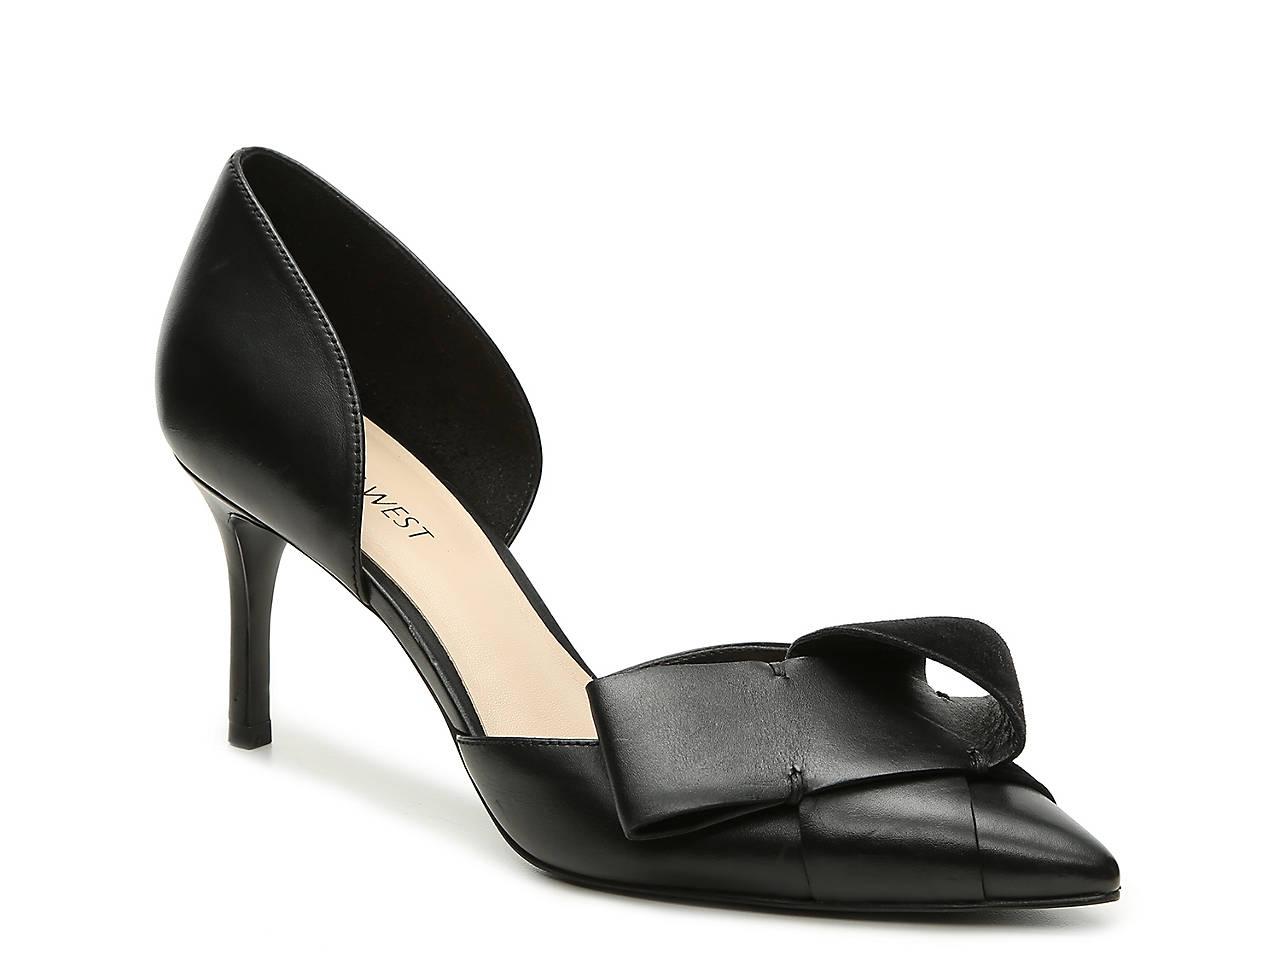 8bc9b97f1c0 Nine West Shamrock Pump Women s Shoes